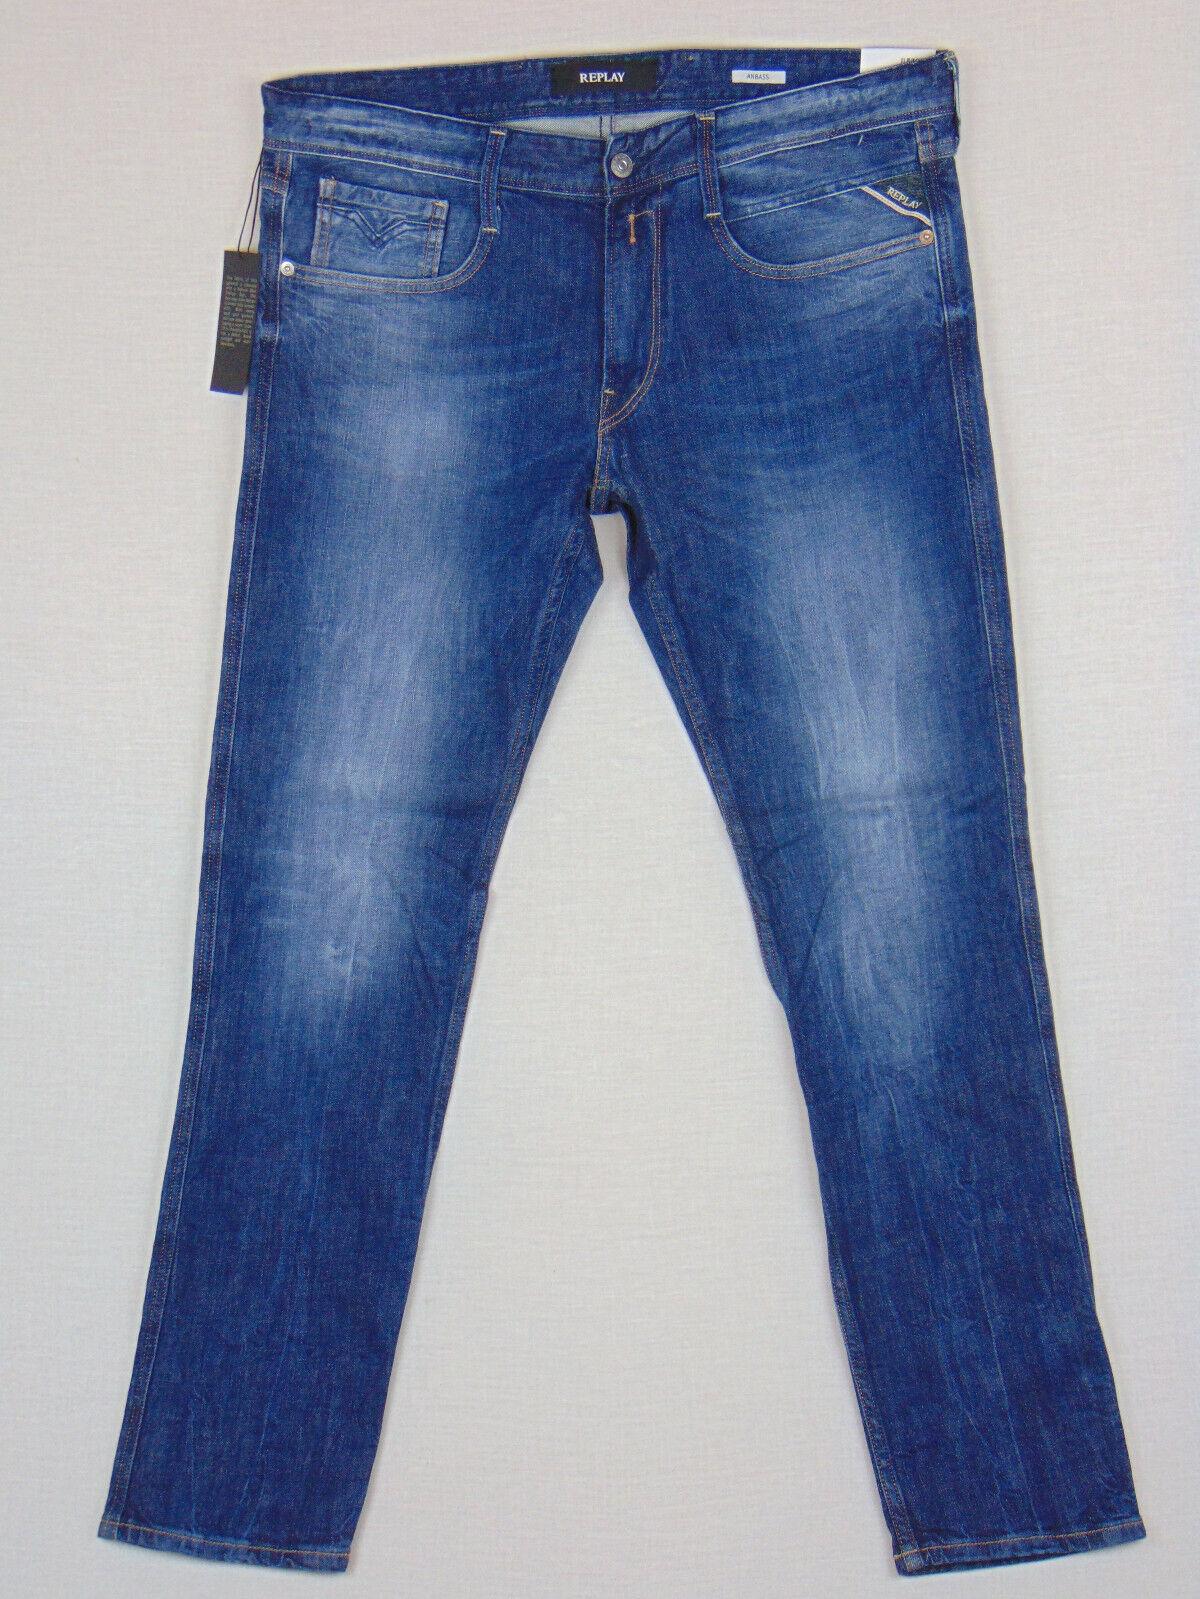 bce6ba7c Replay ANBASS Fit W34 L32 RRP Mens bluee Comfort Denim Jeans Slim  nozxhn9760-Jeans